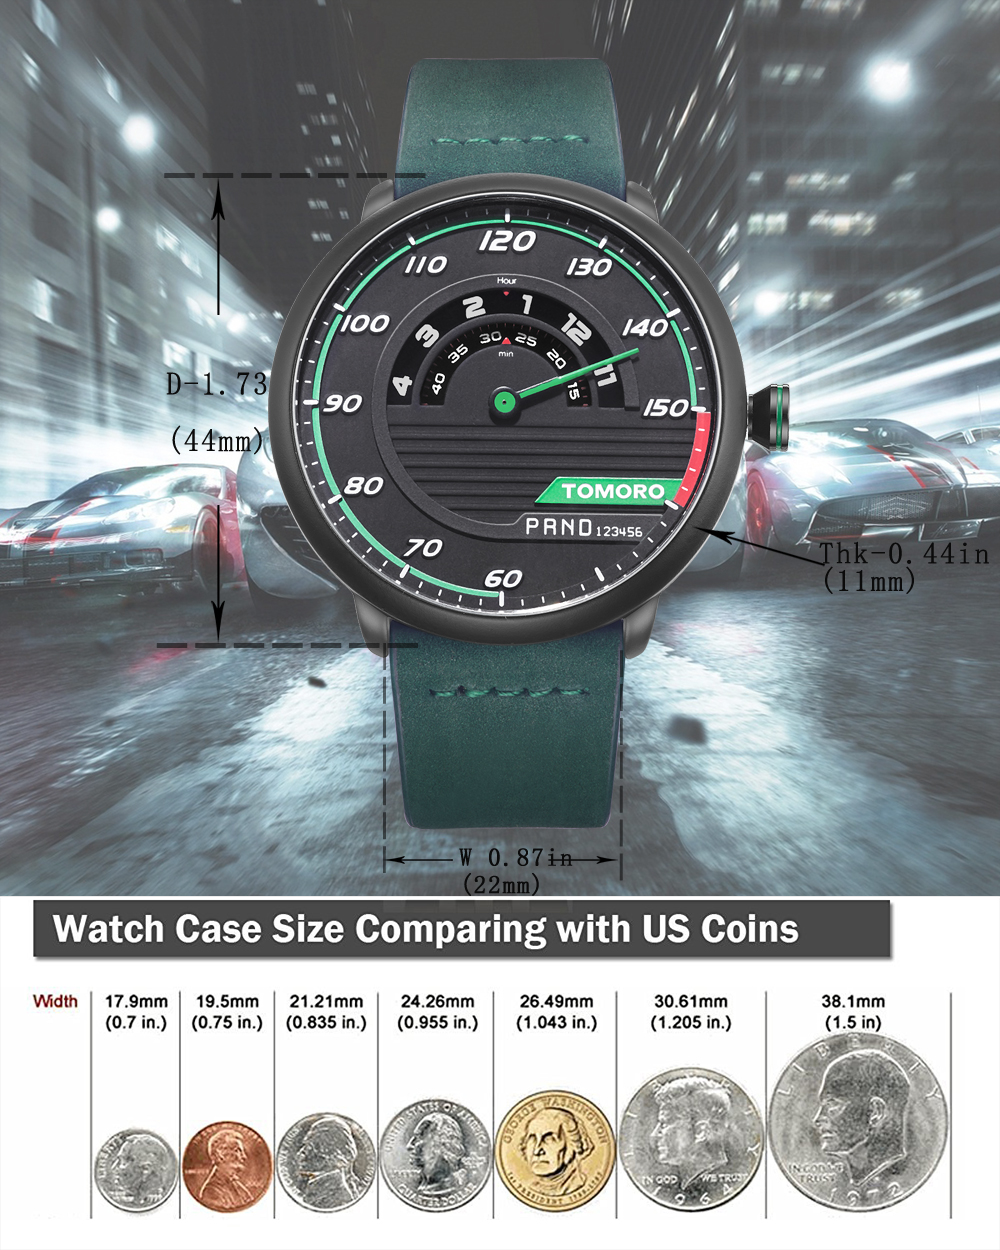 HTB1s1hlQVXXXXbbXFXXq6xXFXXXB TOMORO Men's Unique Racing Car 3D Design Wrist Watch